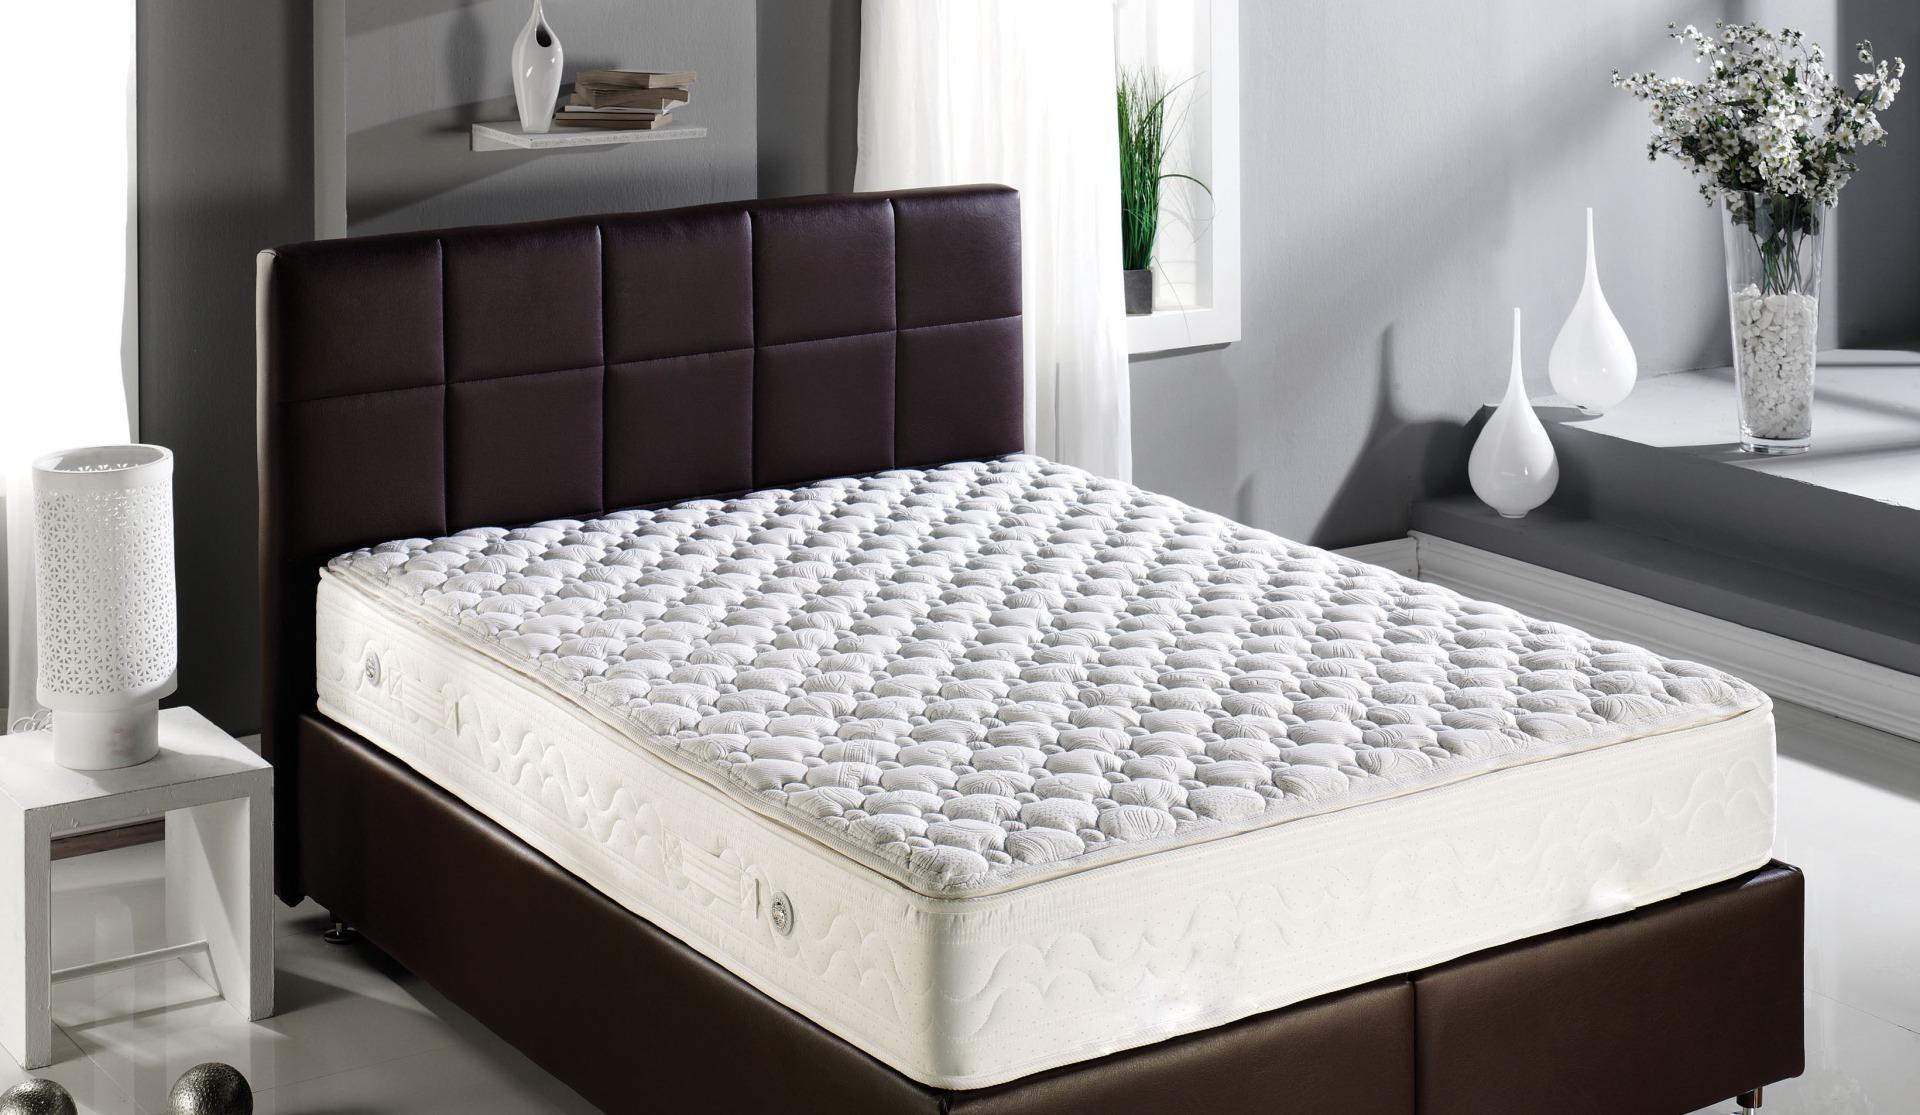 Водяной матрас на кровати из кожи